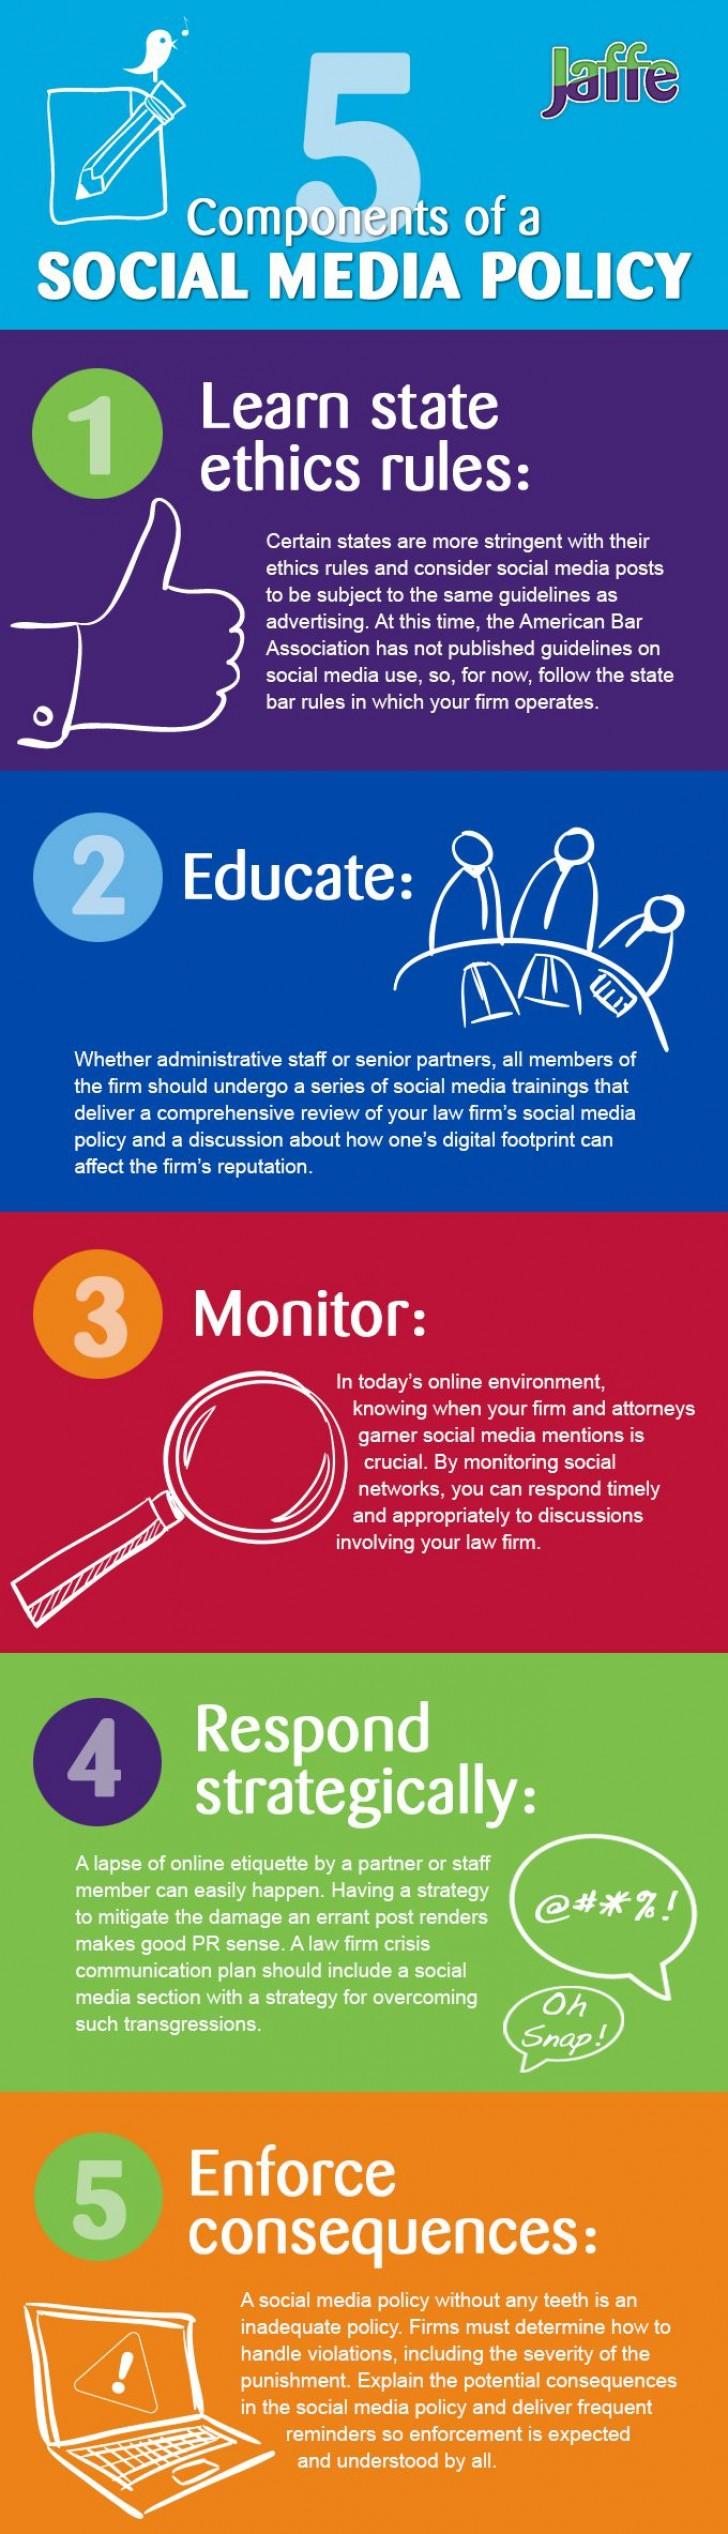 004 Top Social Media Policy Template Sample  2020 Australia Nonprofit728